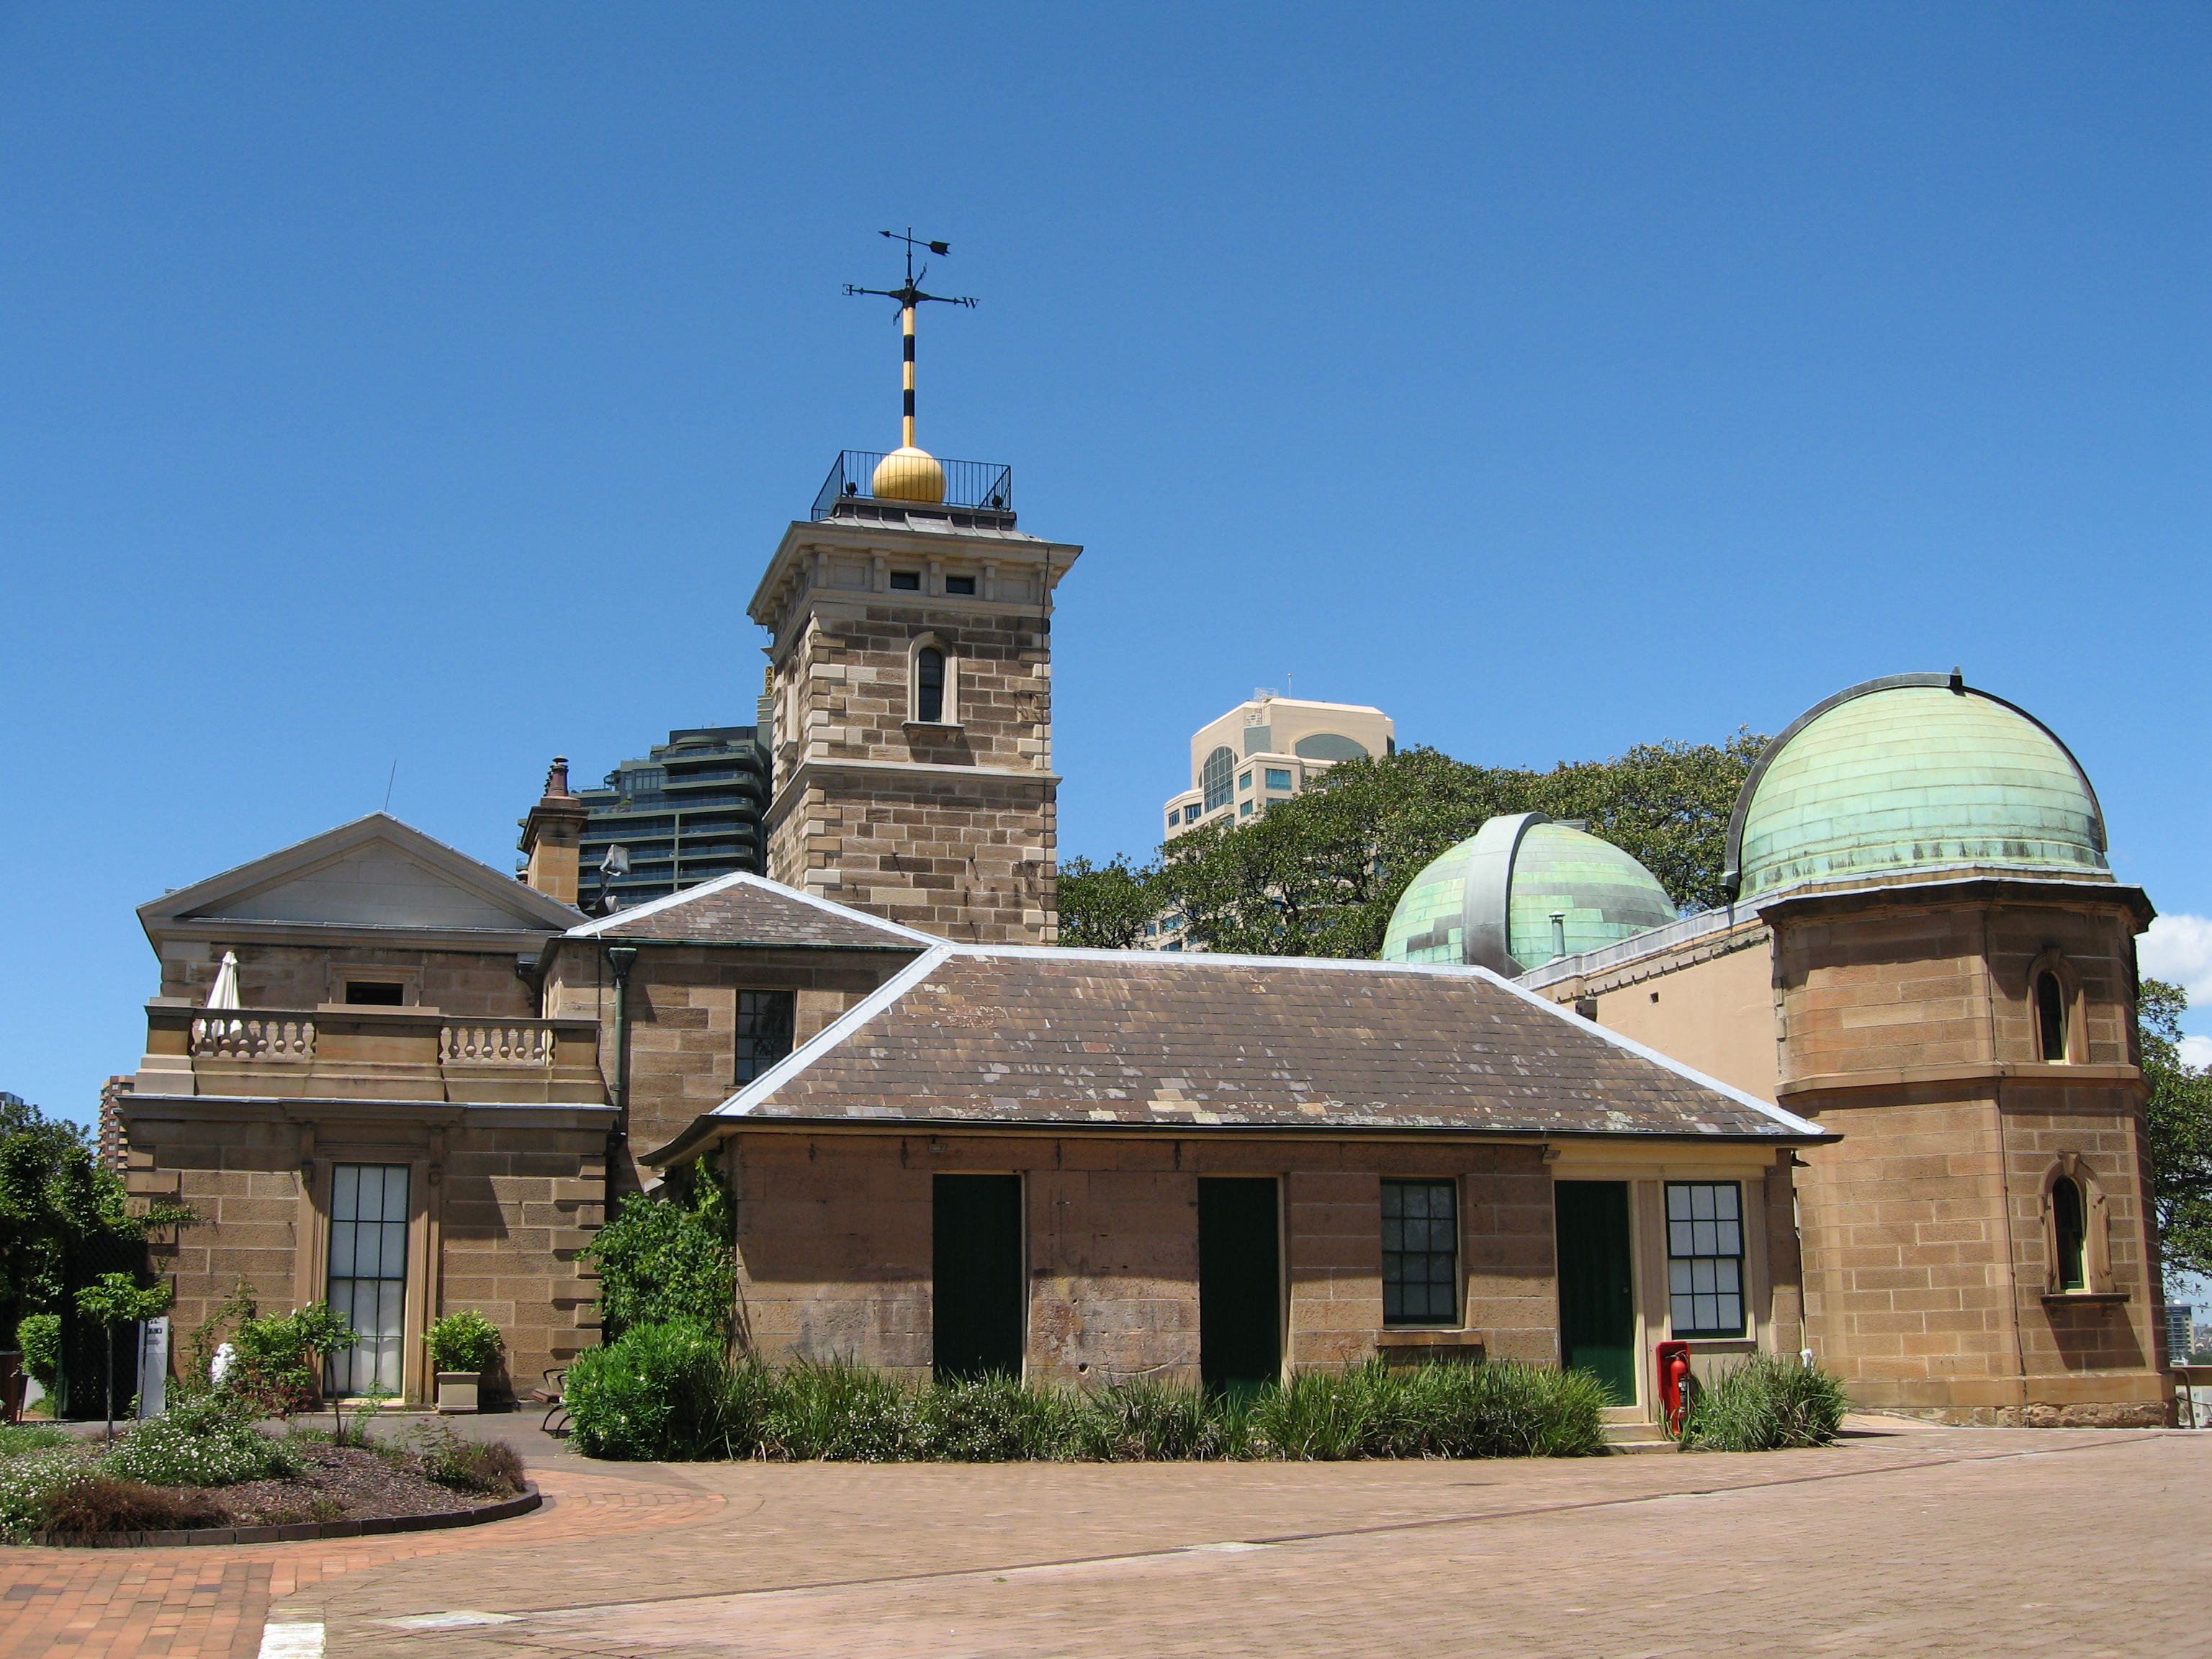 observatory hill sydney australia - photo#22